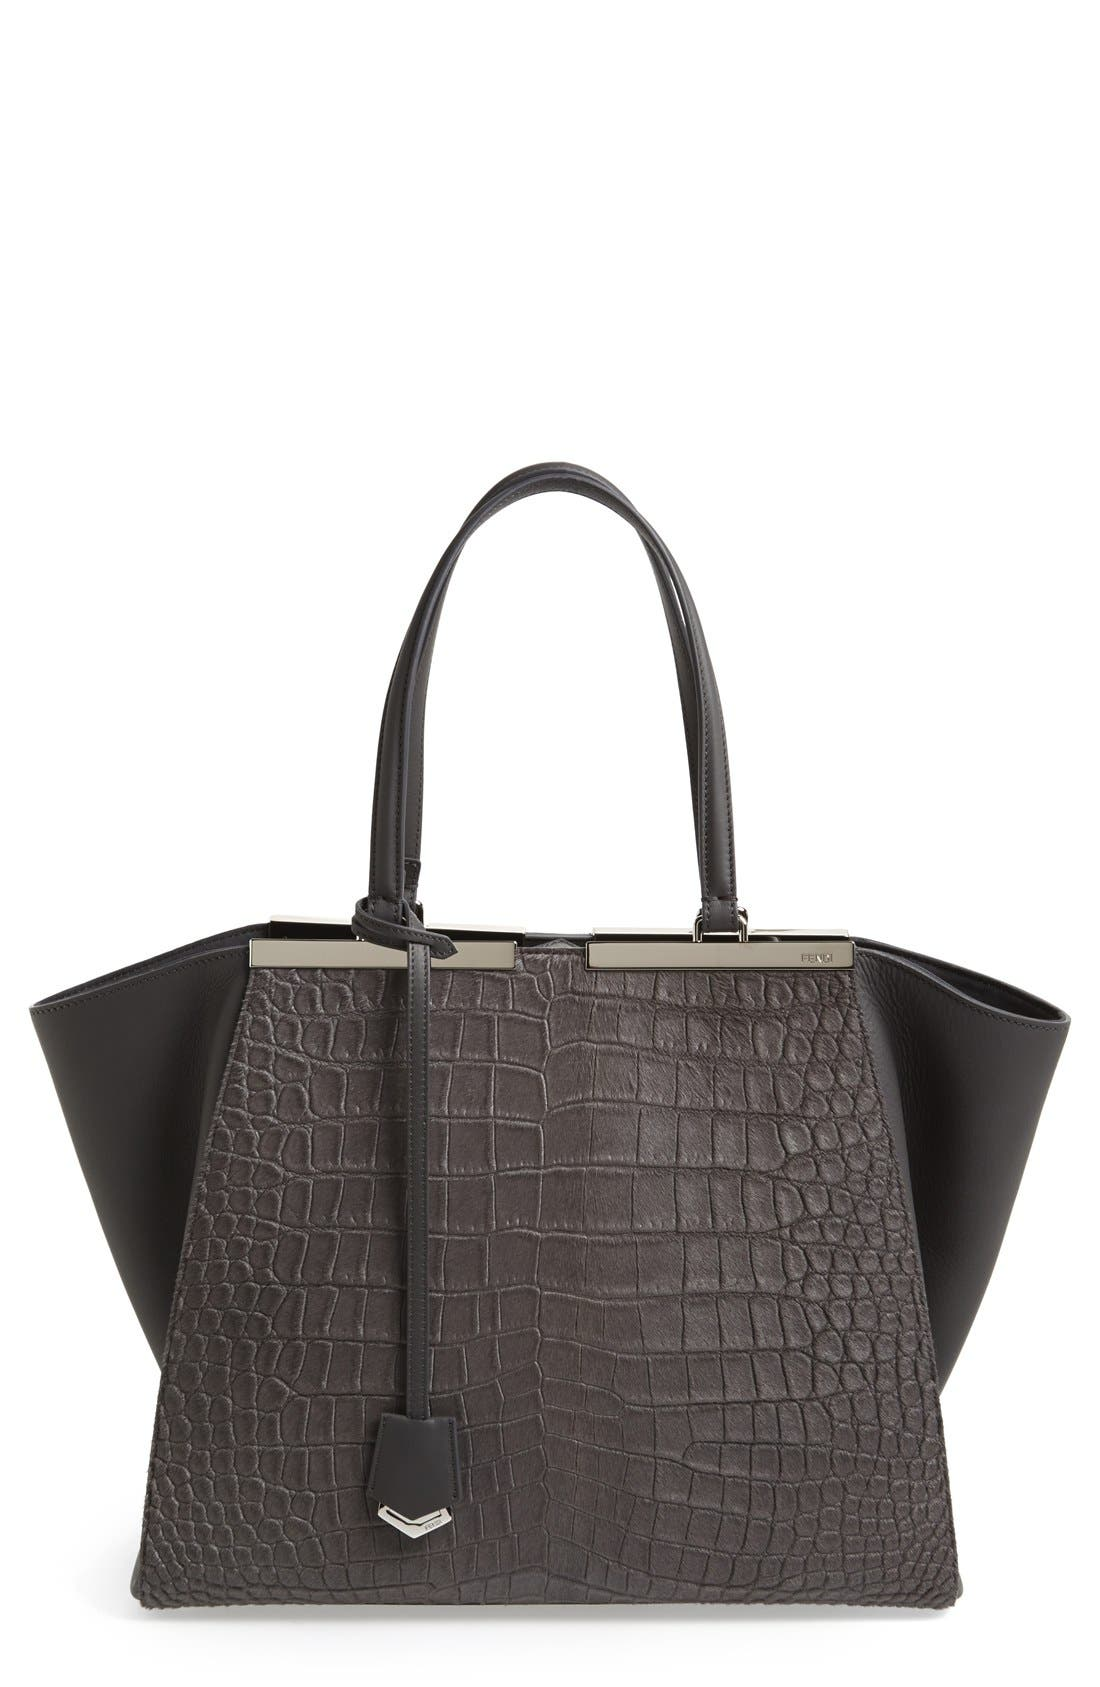 Alternate Image 1 Selected - Fendi '3Jours' Croc Embossed Leather Shopper